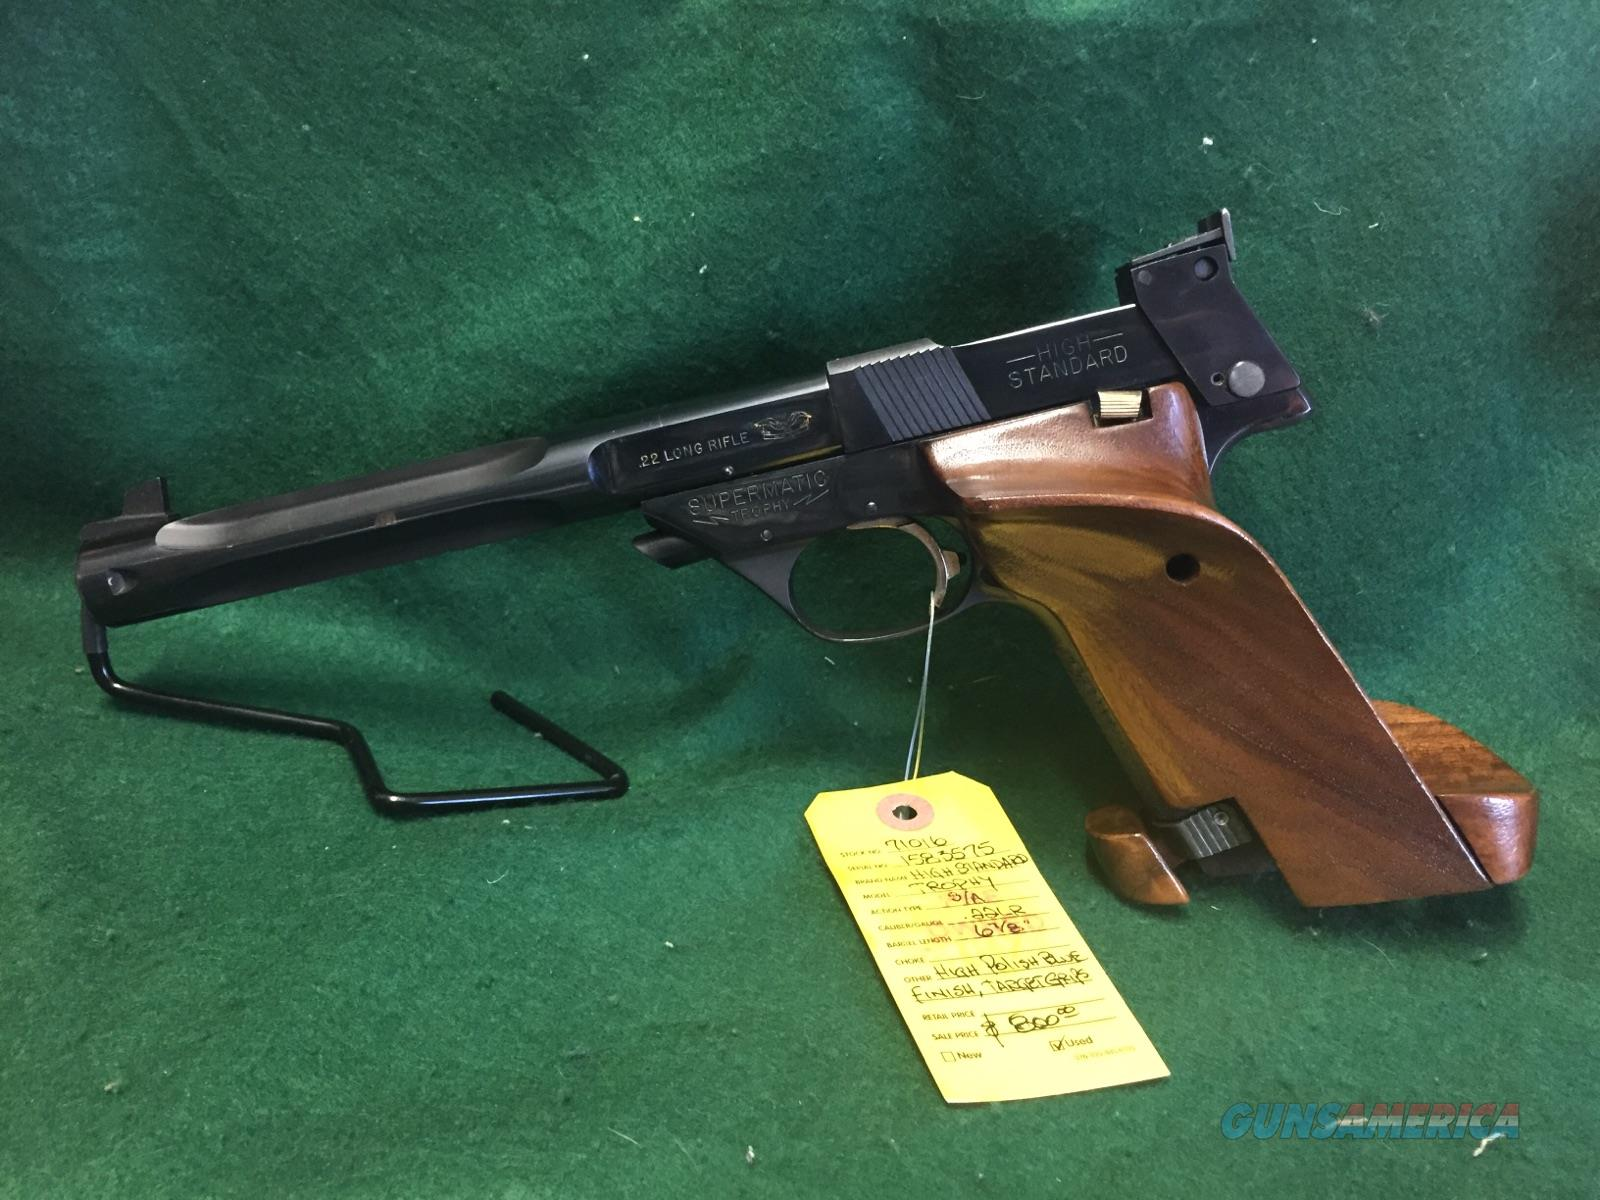 High Standard Supermatic Trophy 106   Guns > Pistols > High Standard Pistols